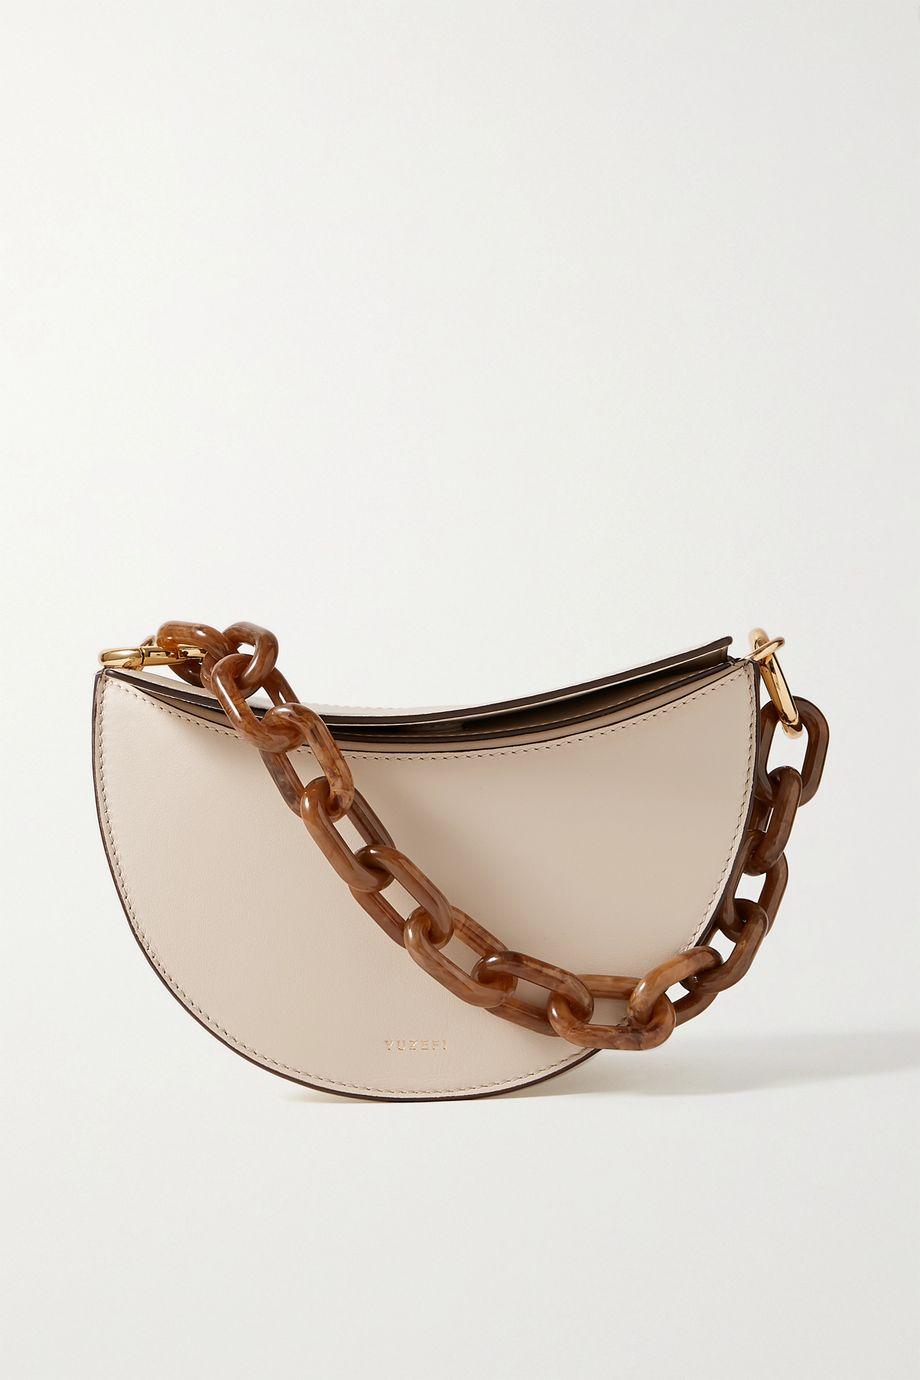 Yuzefi Doris leather tote